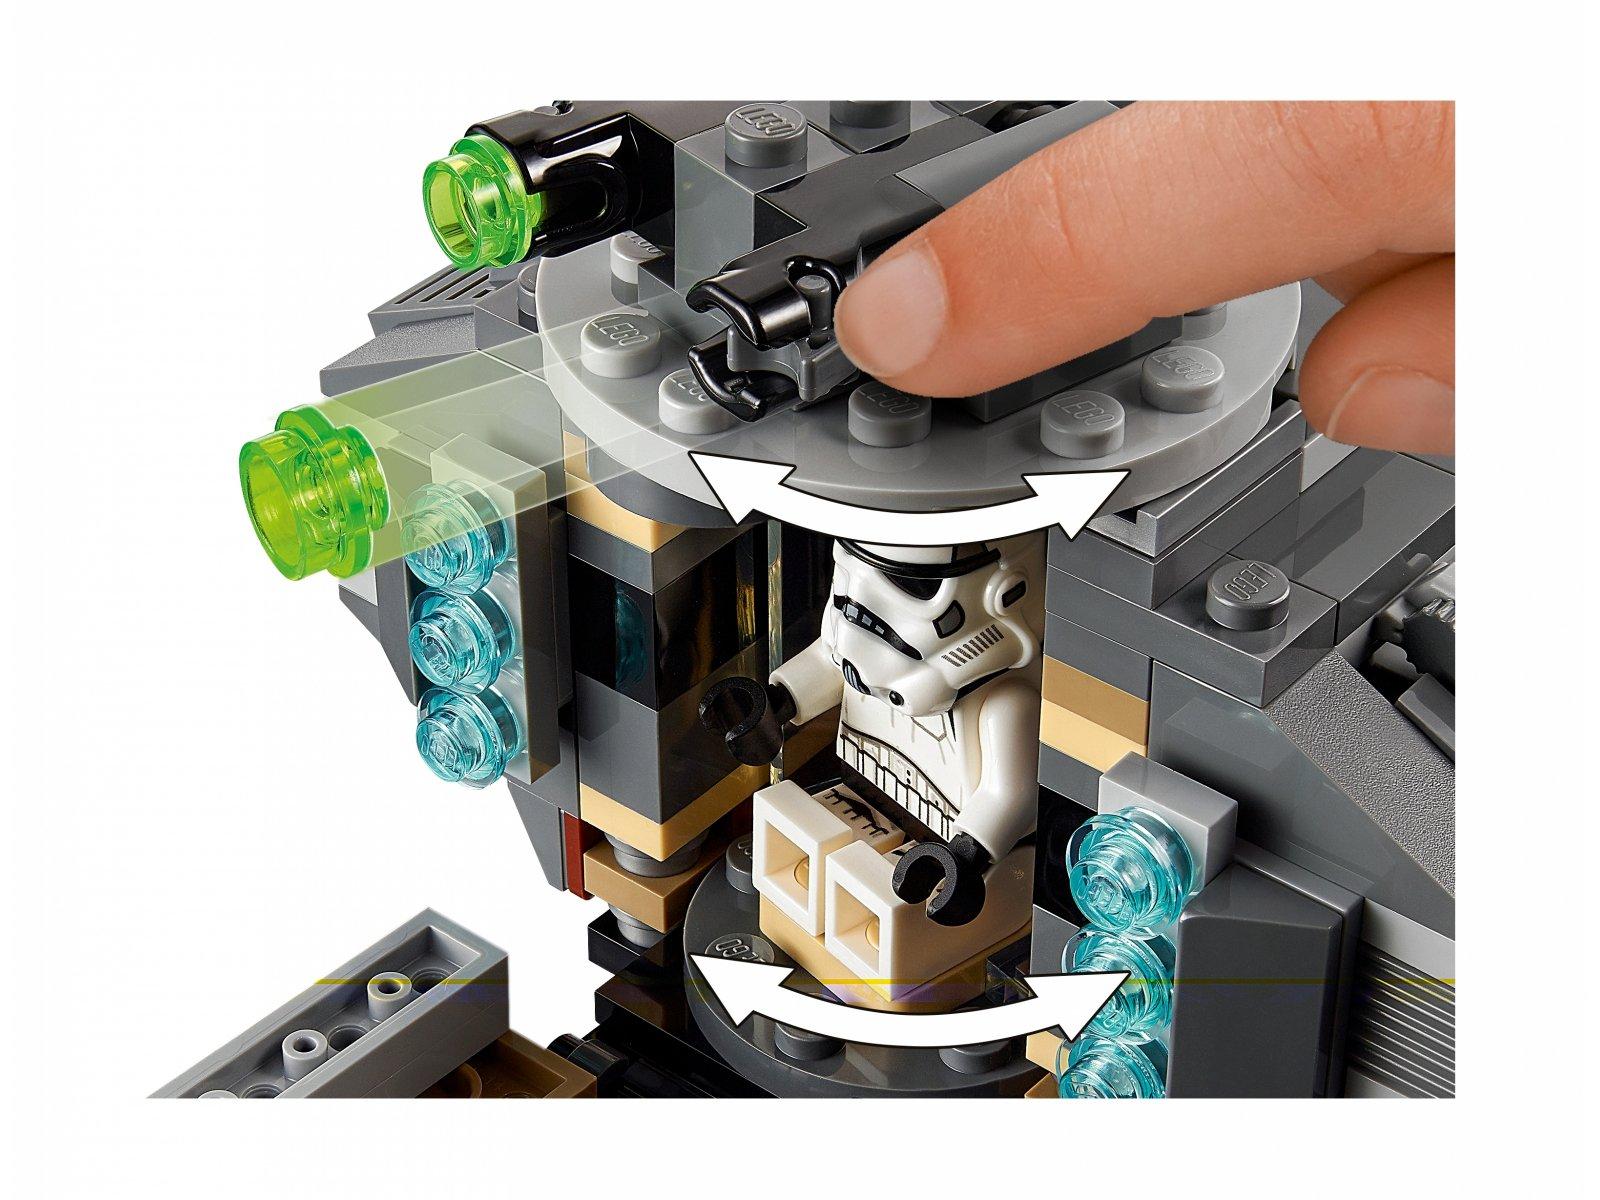 LEGO Star Wars Opancerzony maruder Imperium 75311